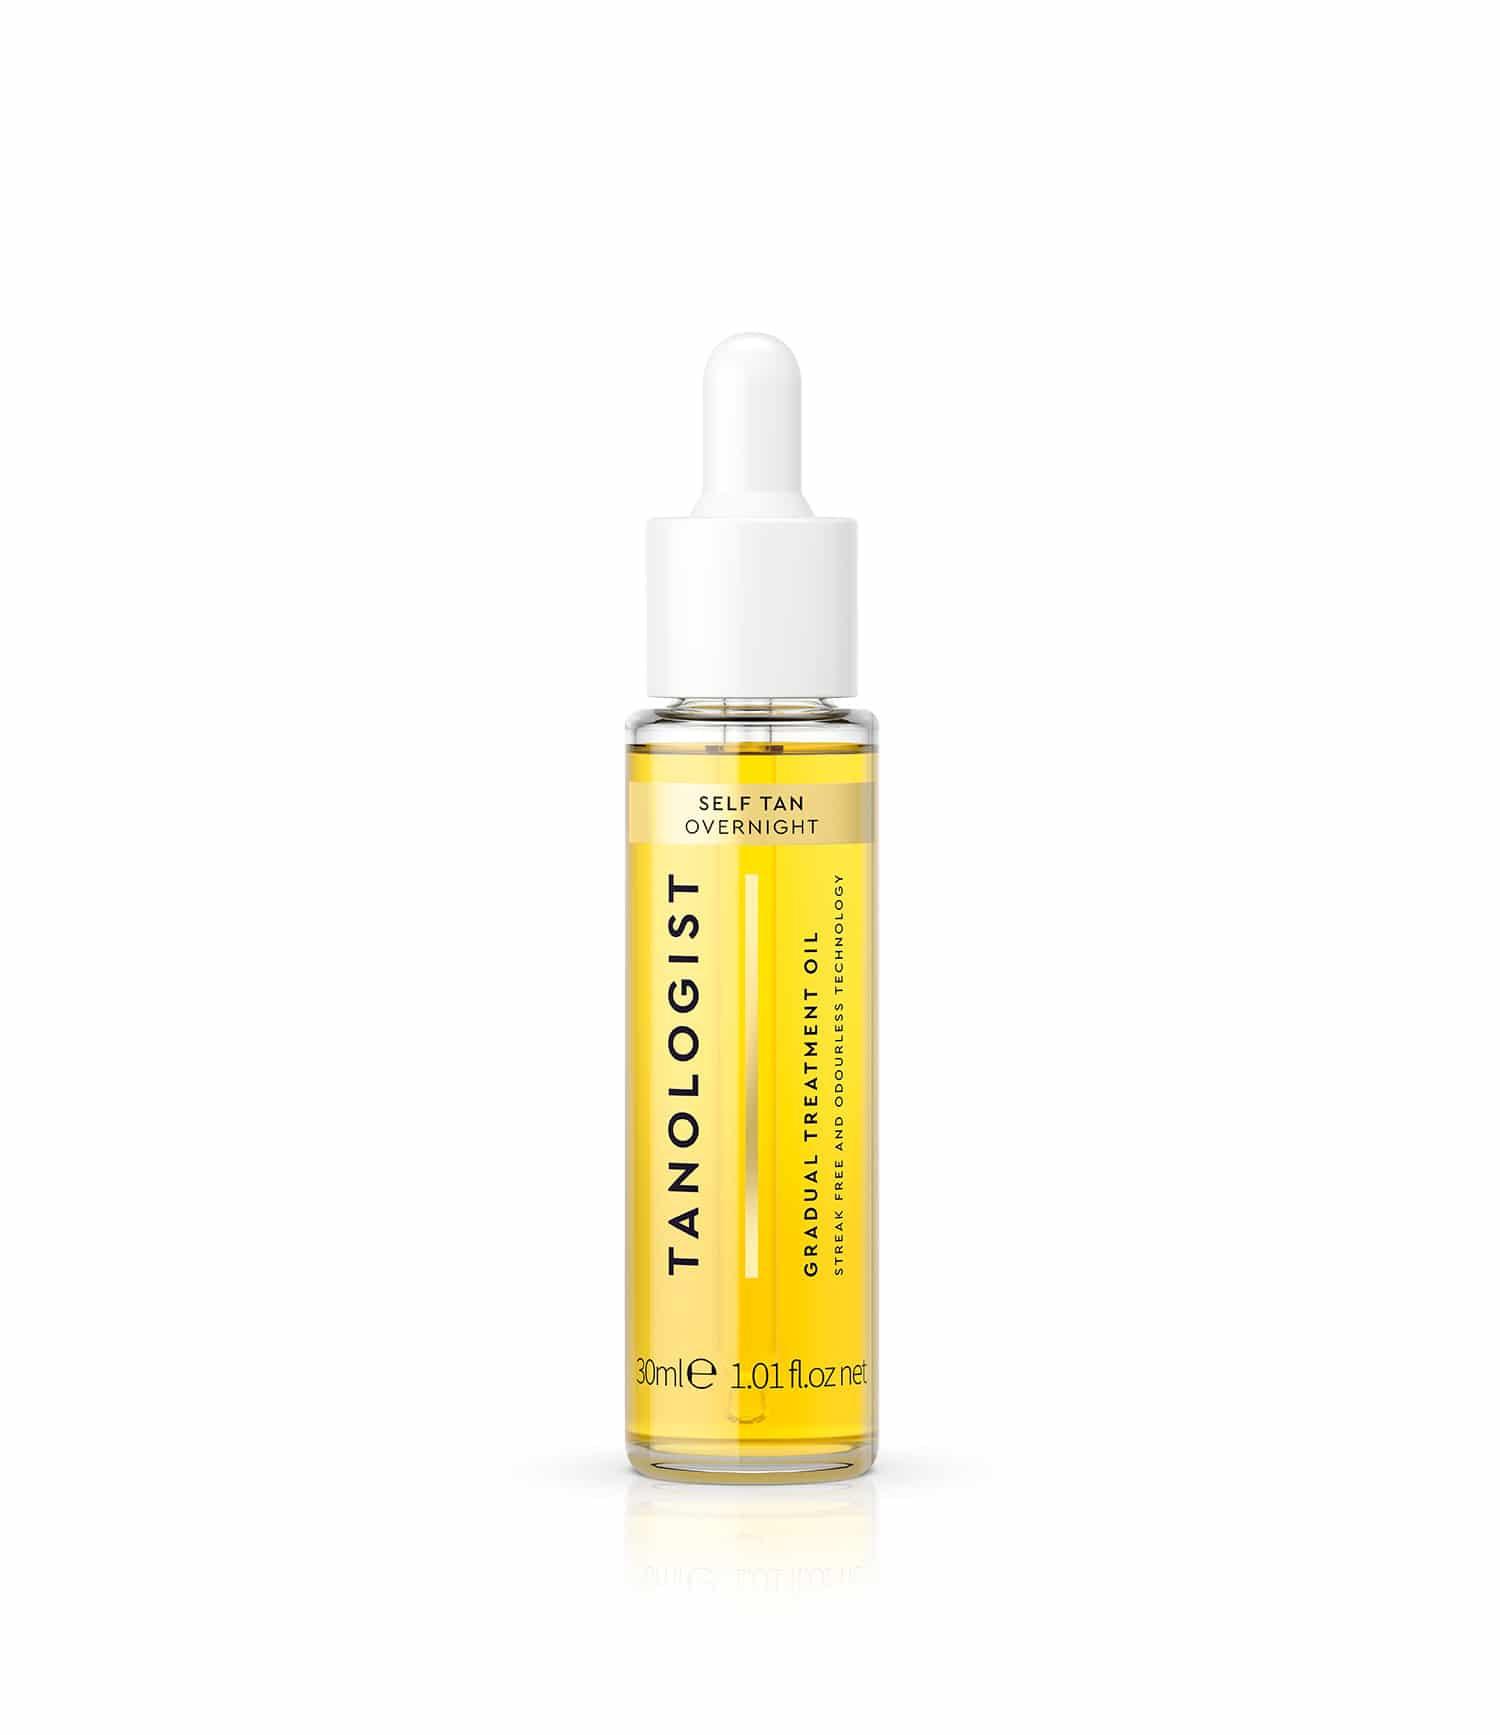 Tanologist Overnight Gradual Tan Treatment Oil